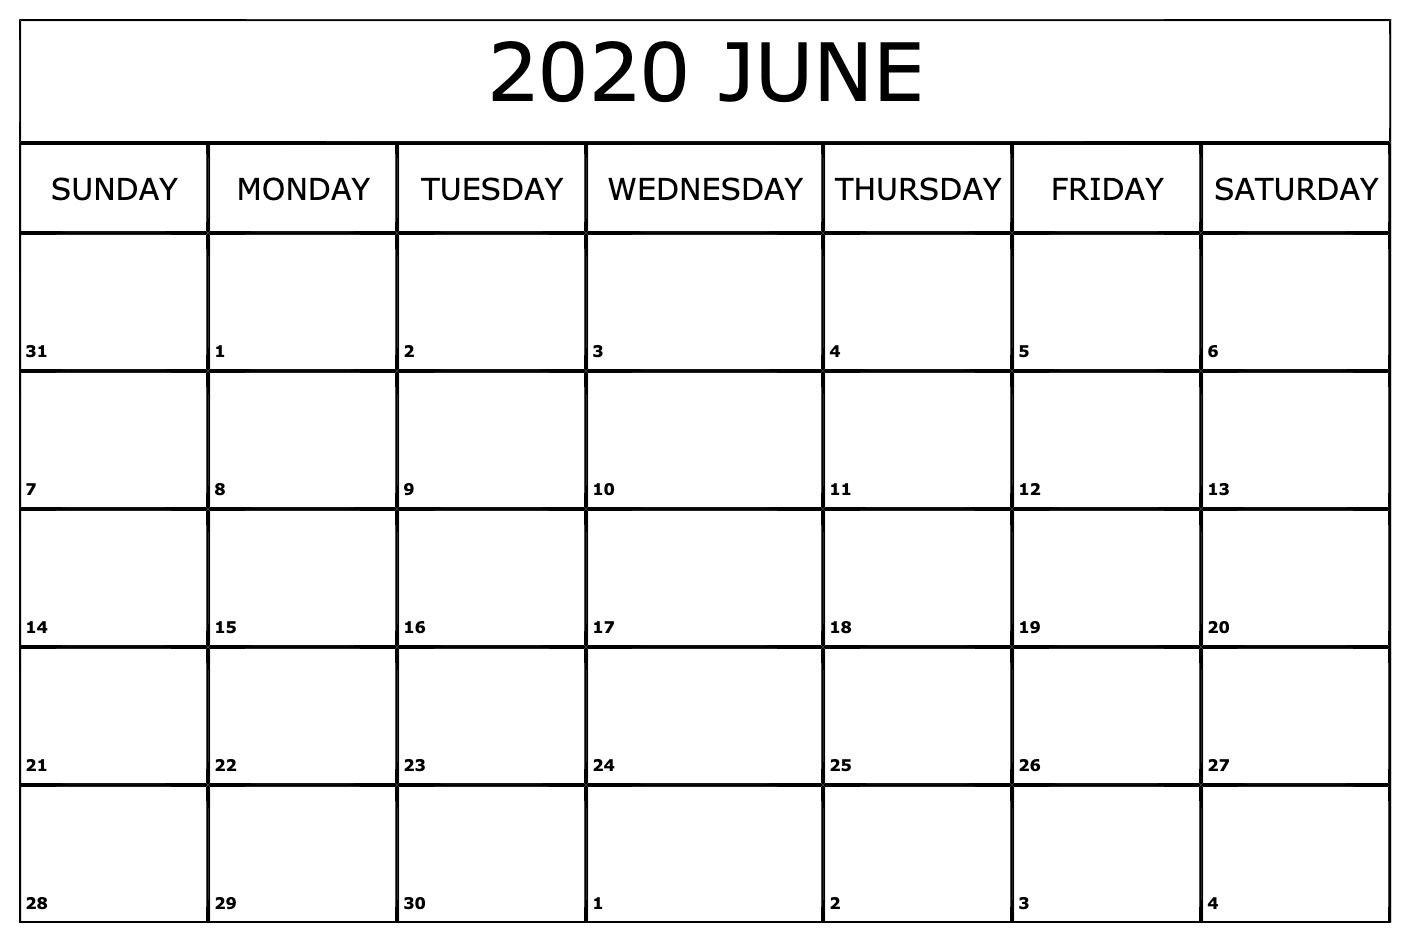 Calendar June 2020 Monthly